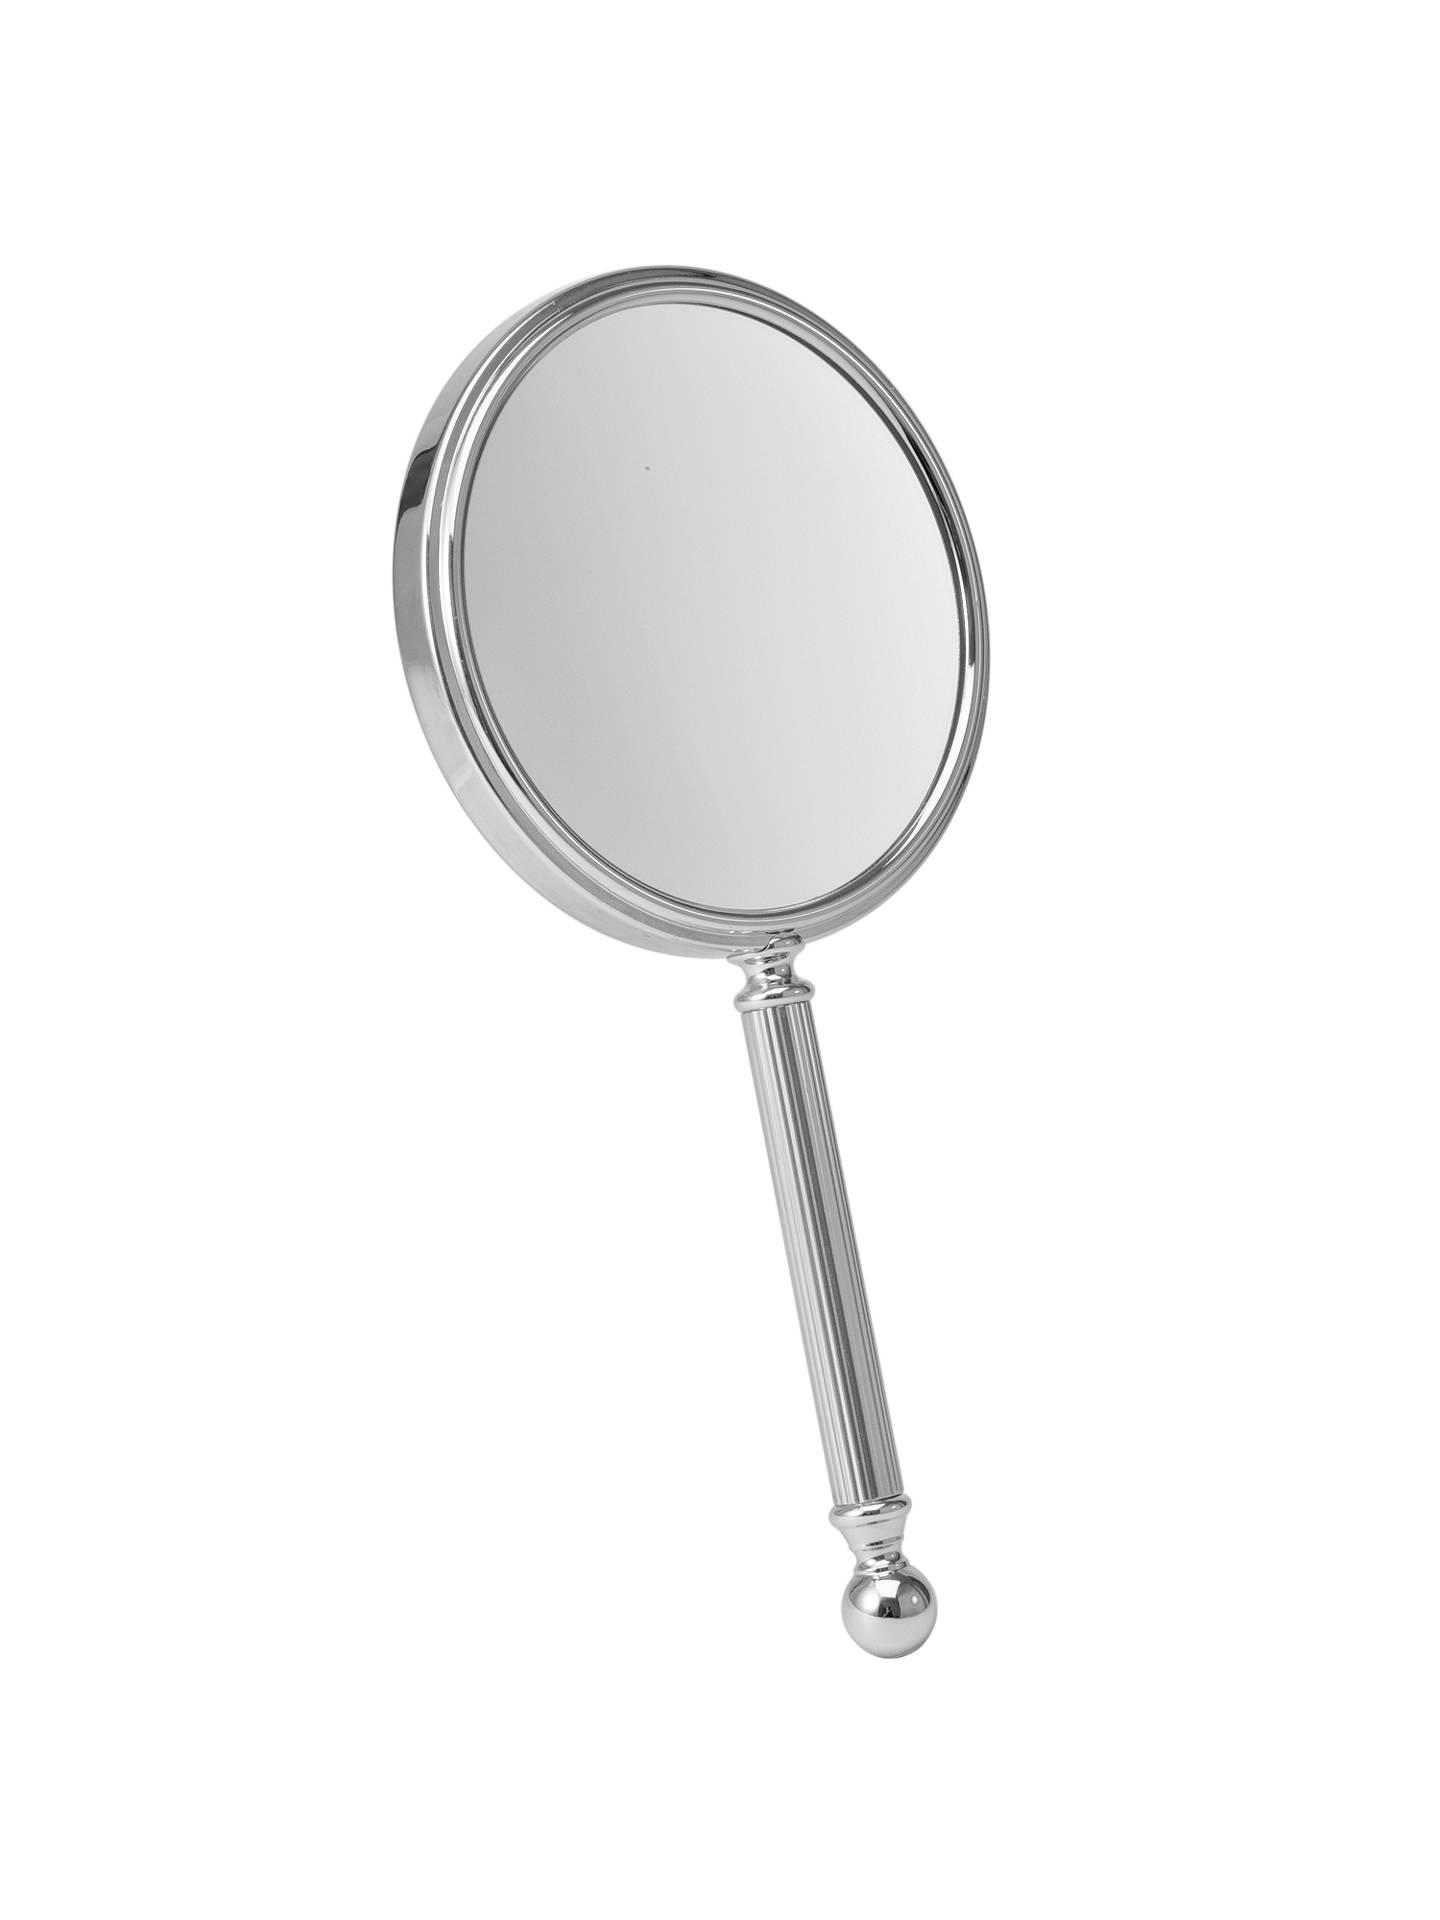 John Lewis 3x Magnification Handheld Mirror Chrome At Johnlewis Com